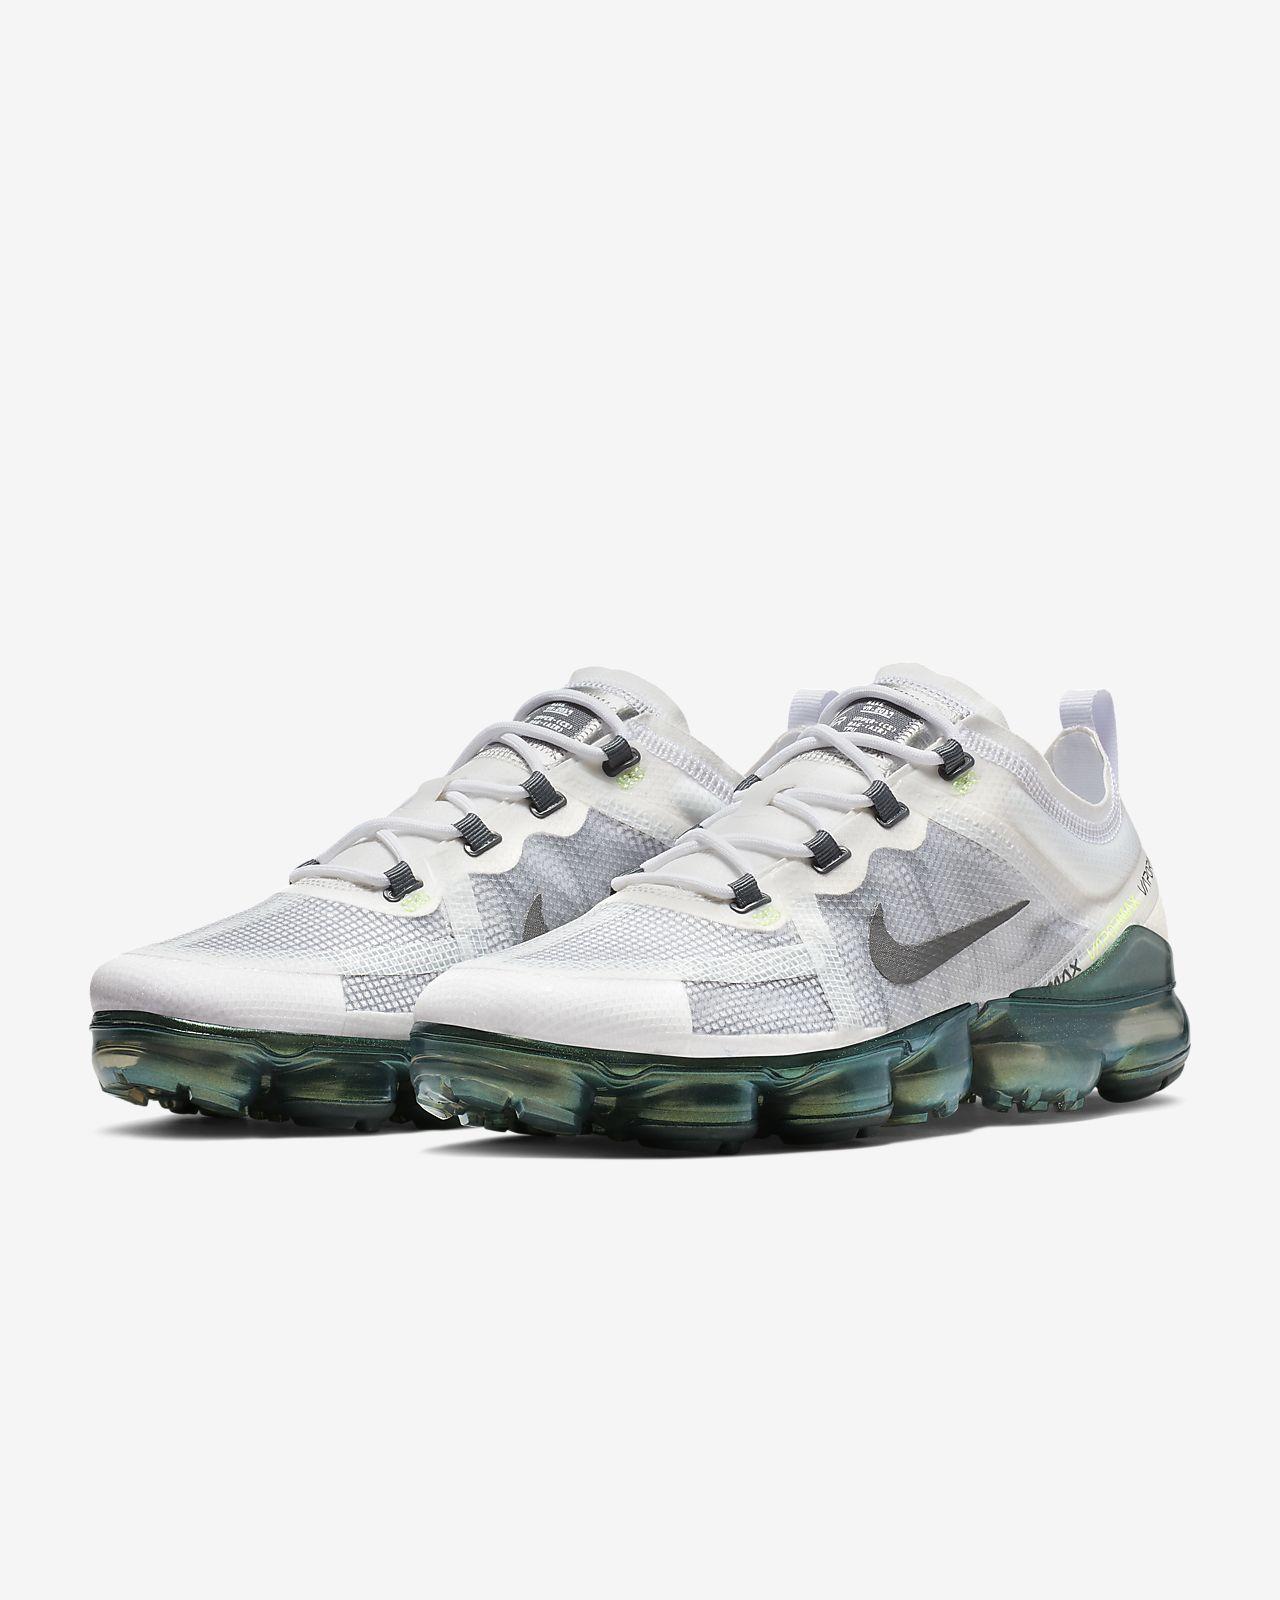 d3260e7dda Nike Air VaporMax 2019 Premium Shoe. Nike.com IN